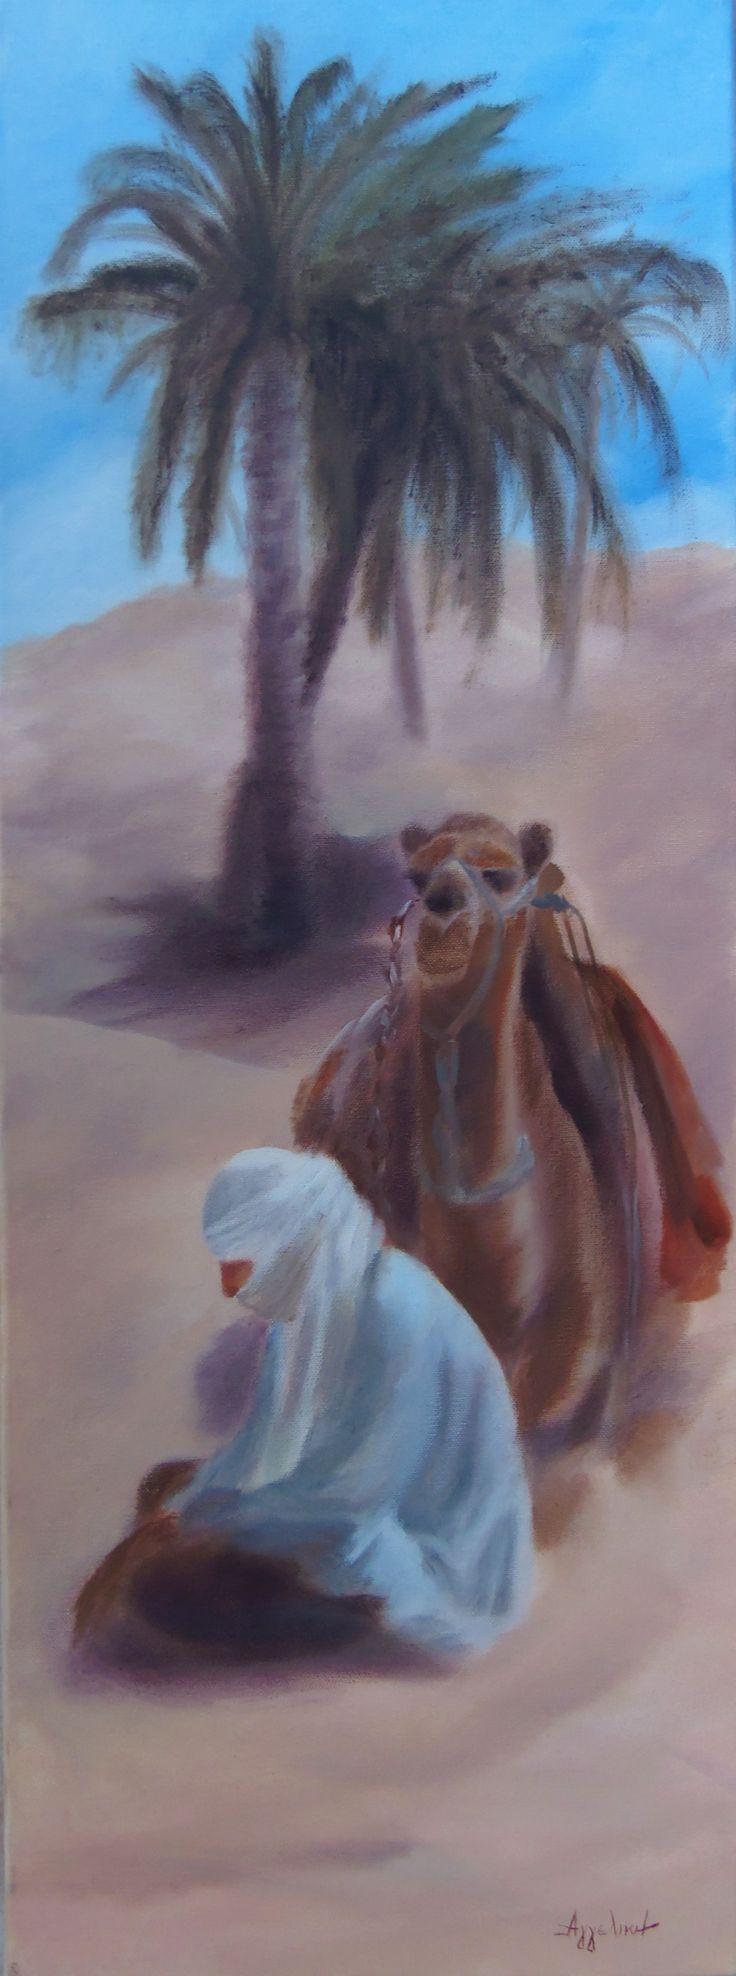 'Beduin' by ΑγγελικΗ, 30X80cm, oil on canvas